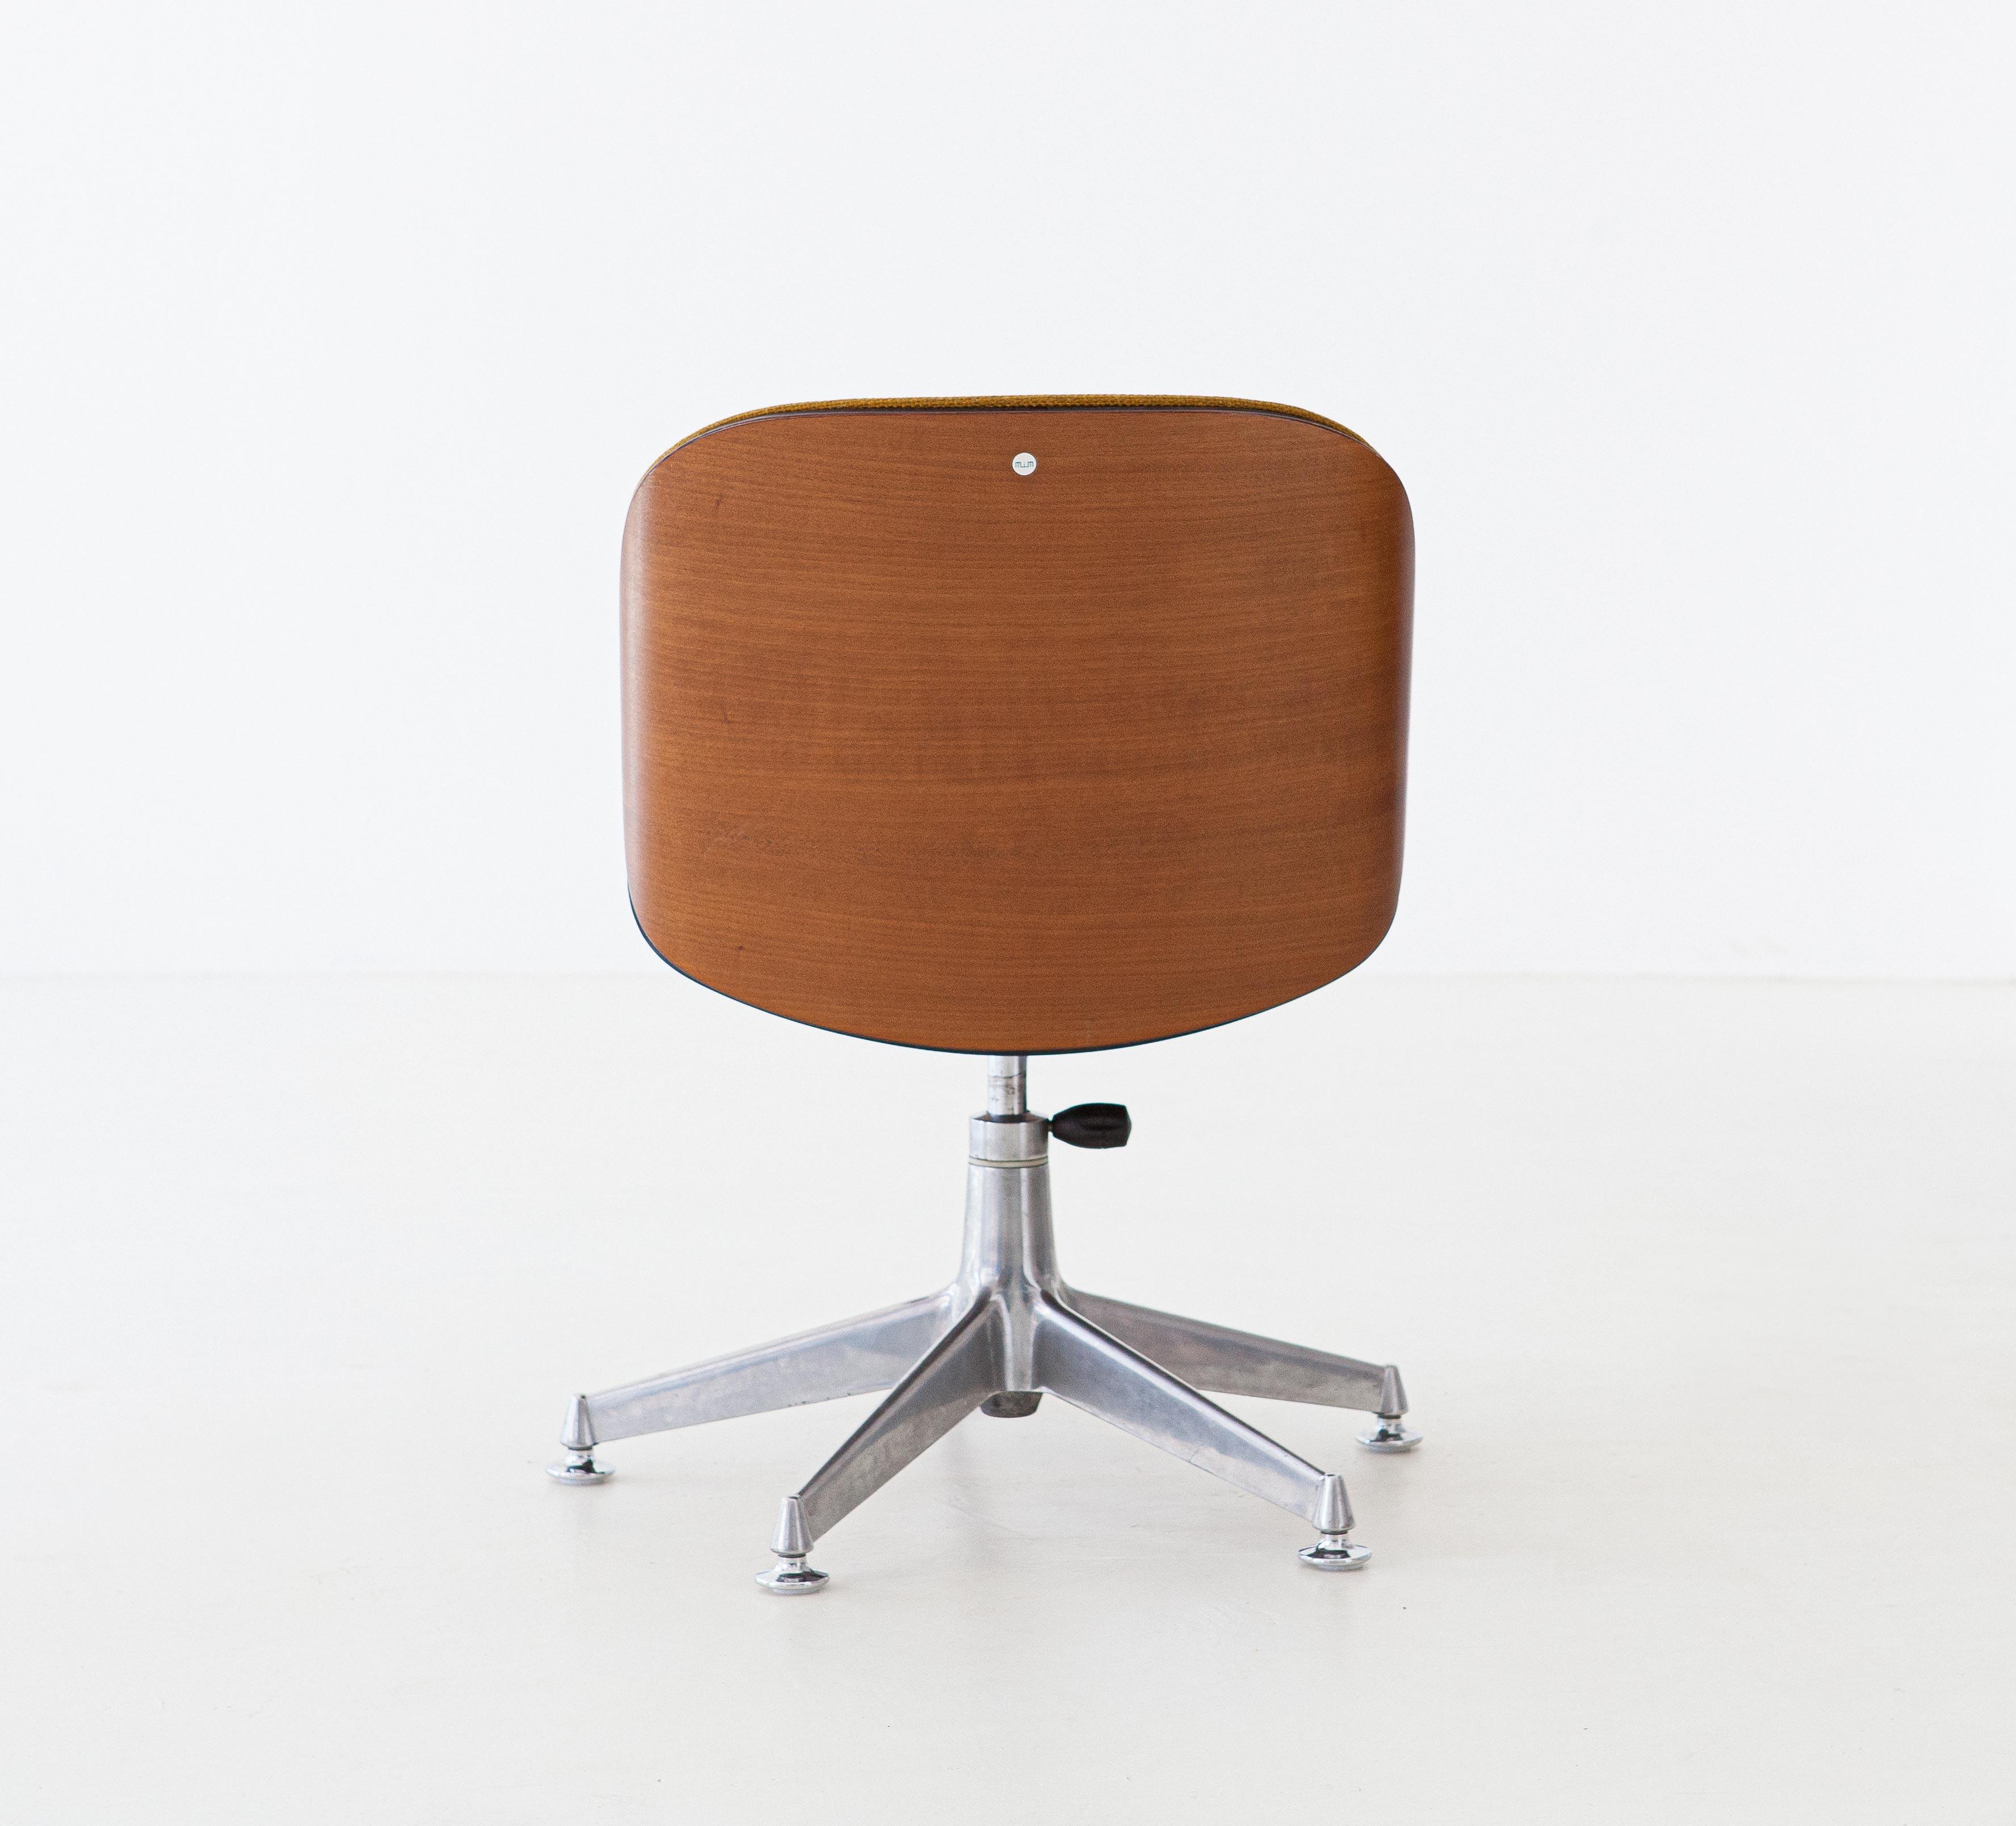 1950s-ico-parisi-for-mim-walnut-swivel-desk-chairs-8-se305